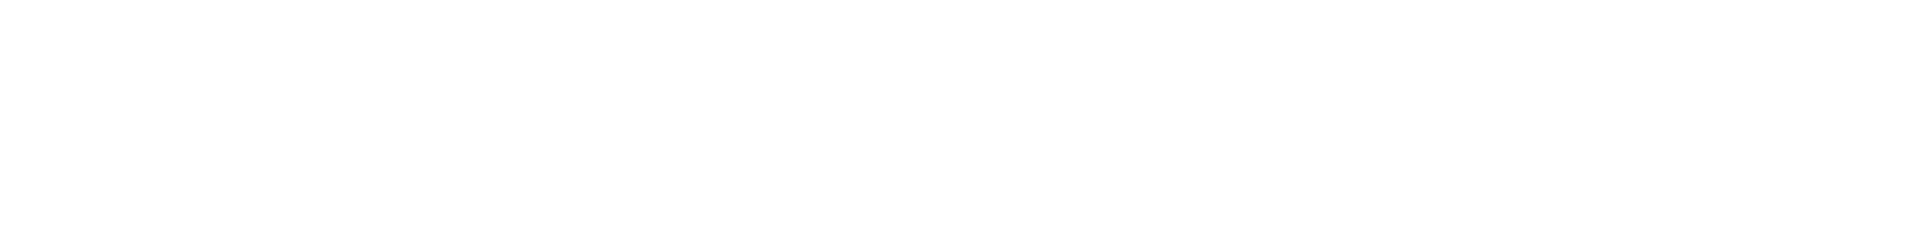 safetycal-logo